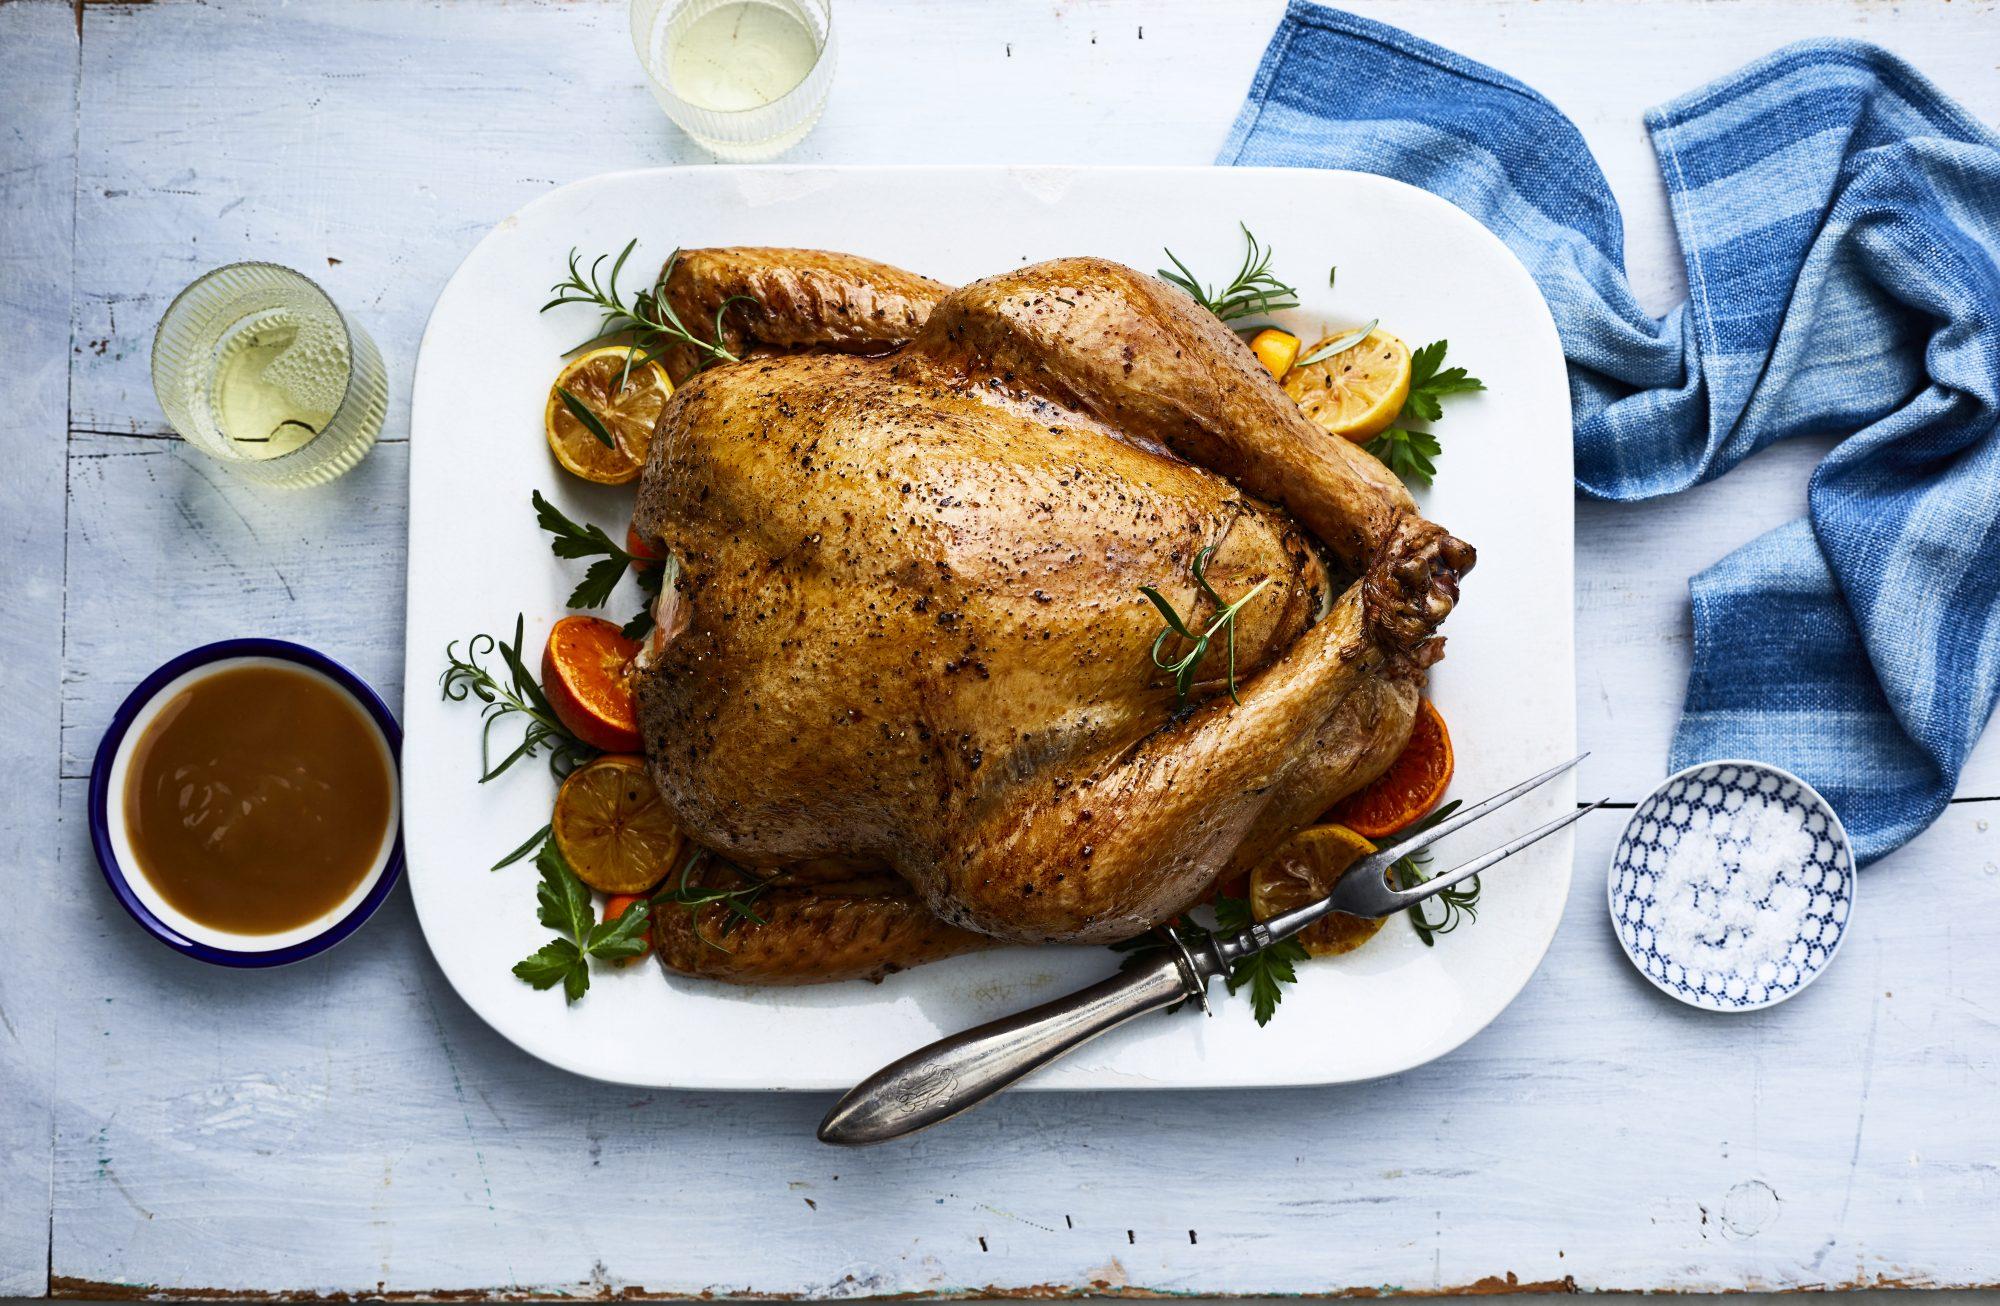 mr- classic roast turkey